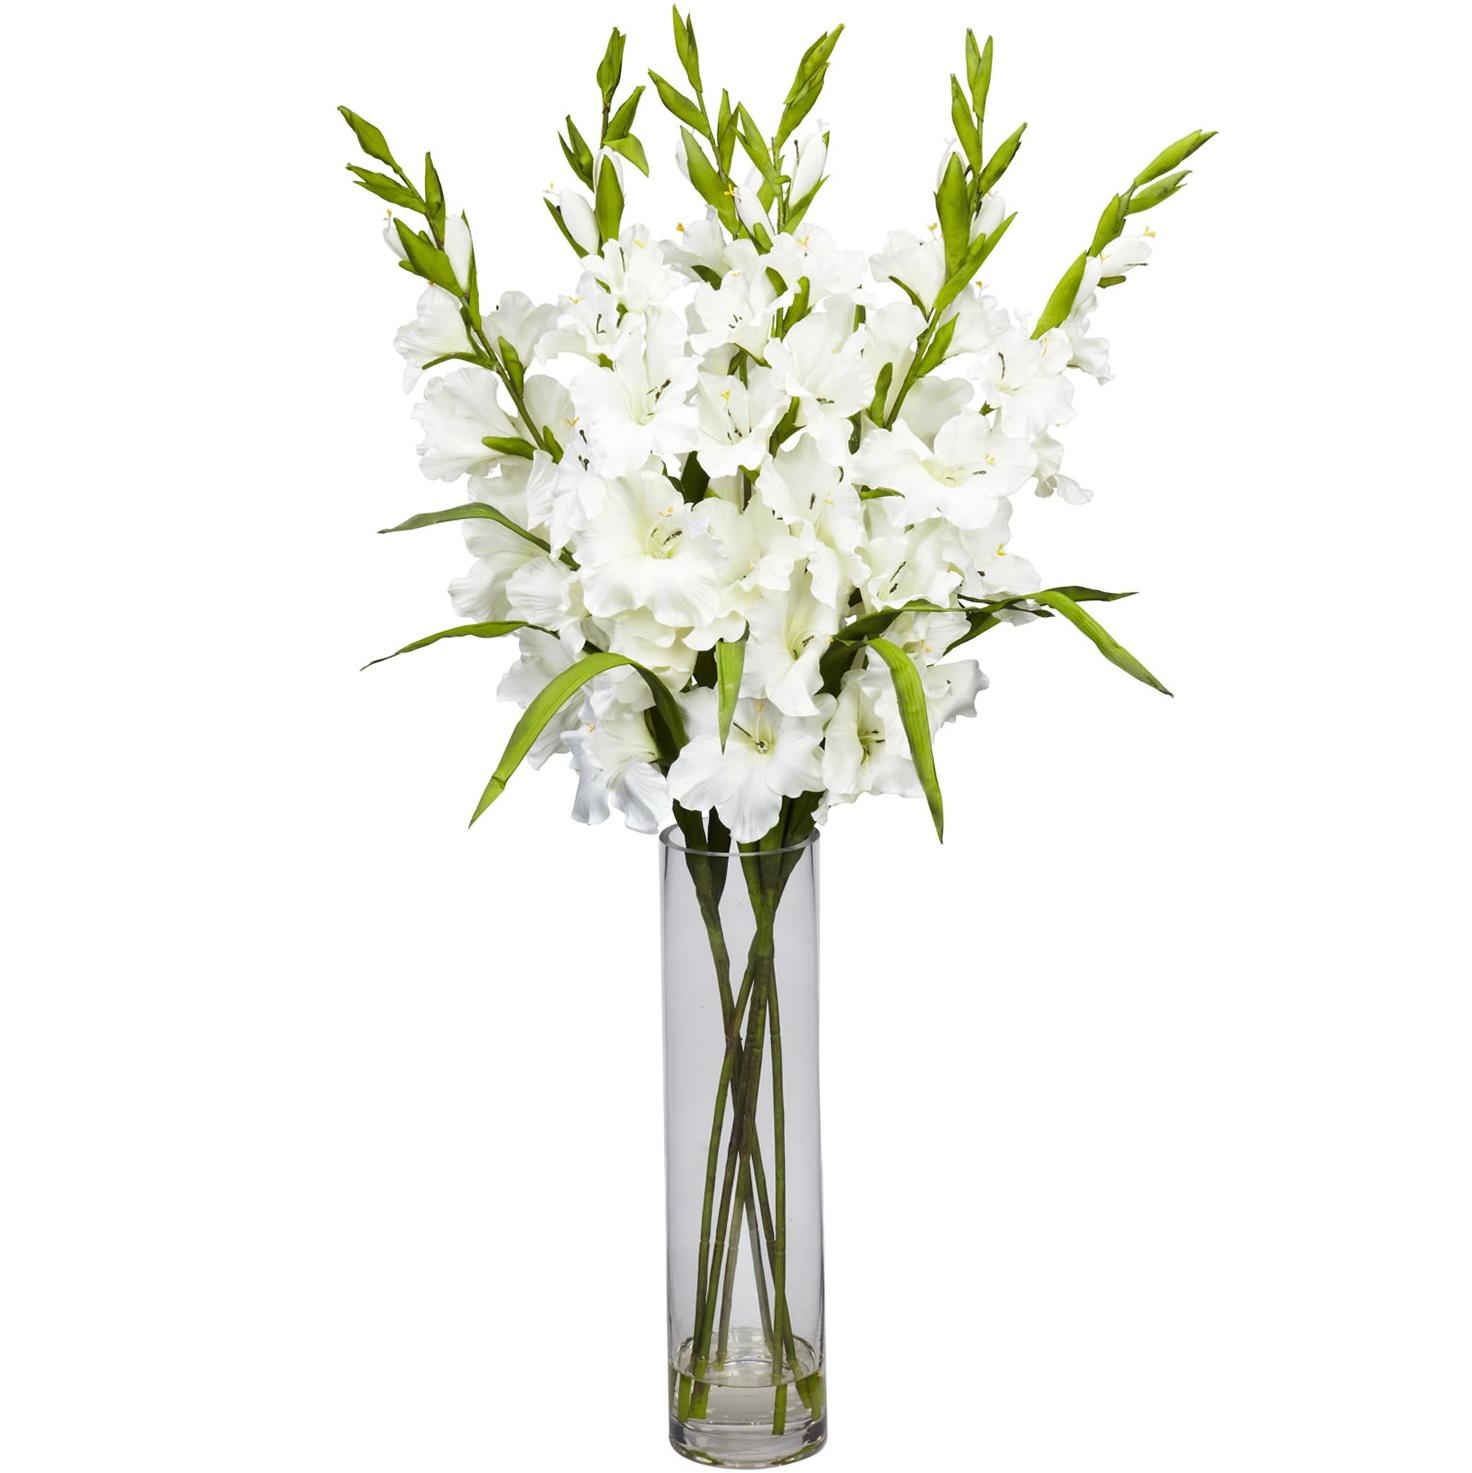 Flower Vases Wholesale Uk